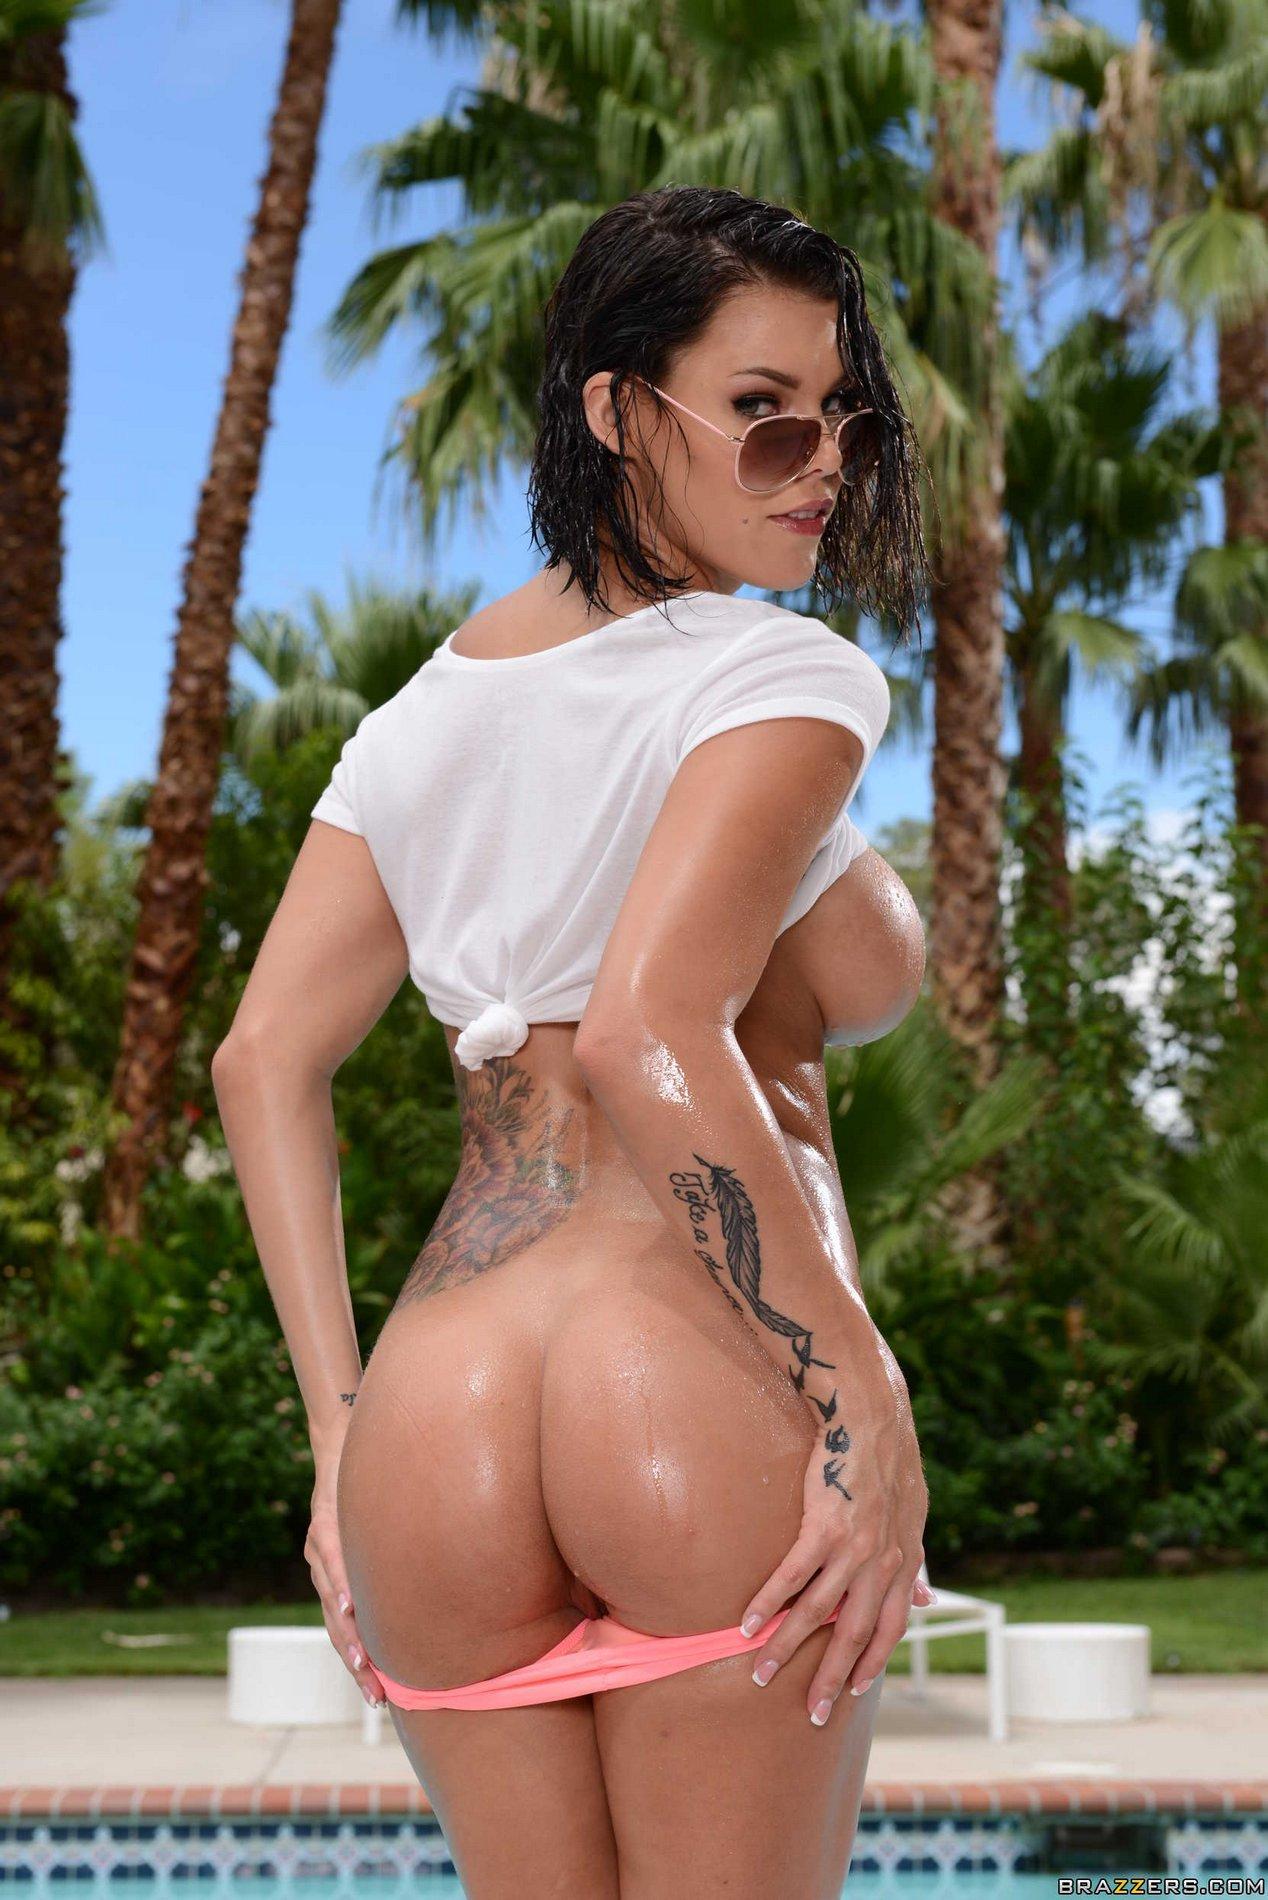 Amazing anal latina on the beach 8